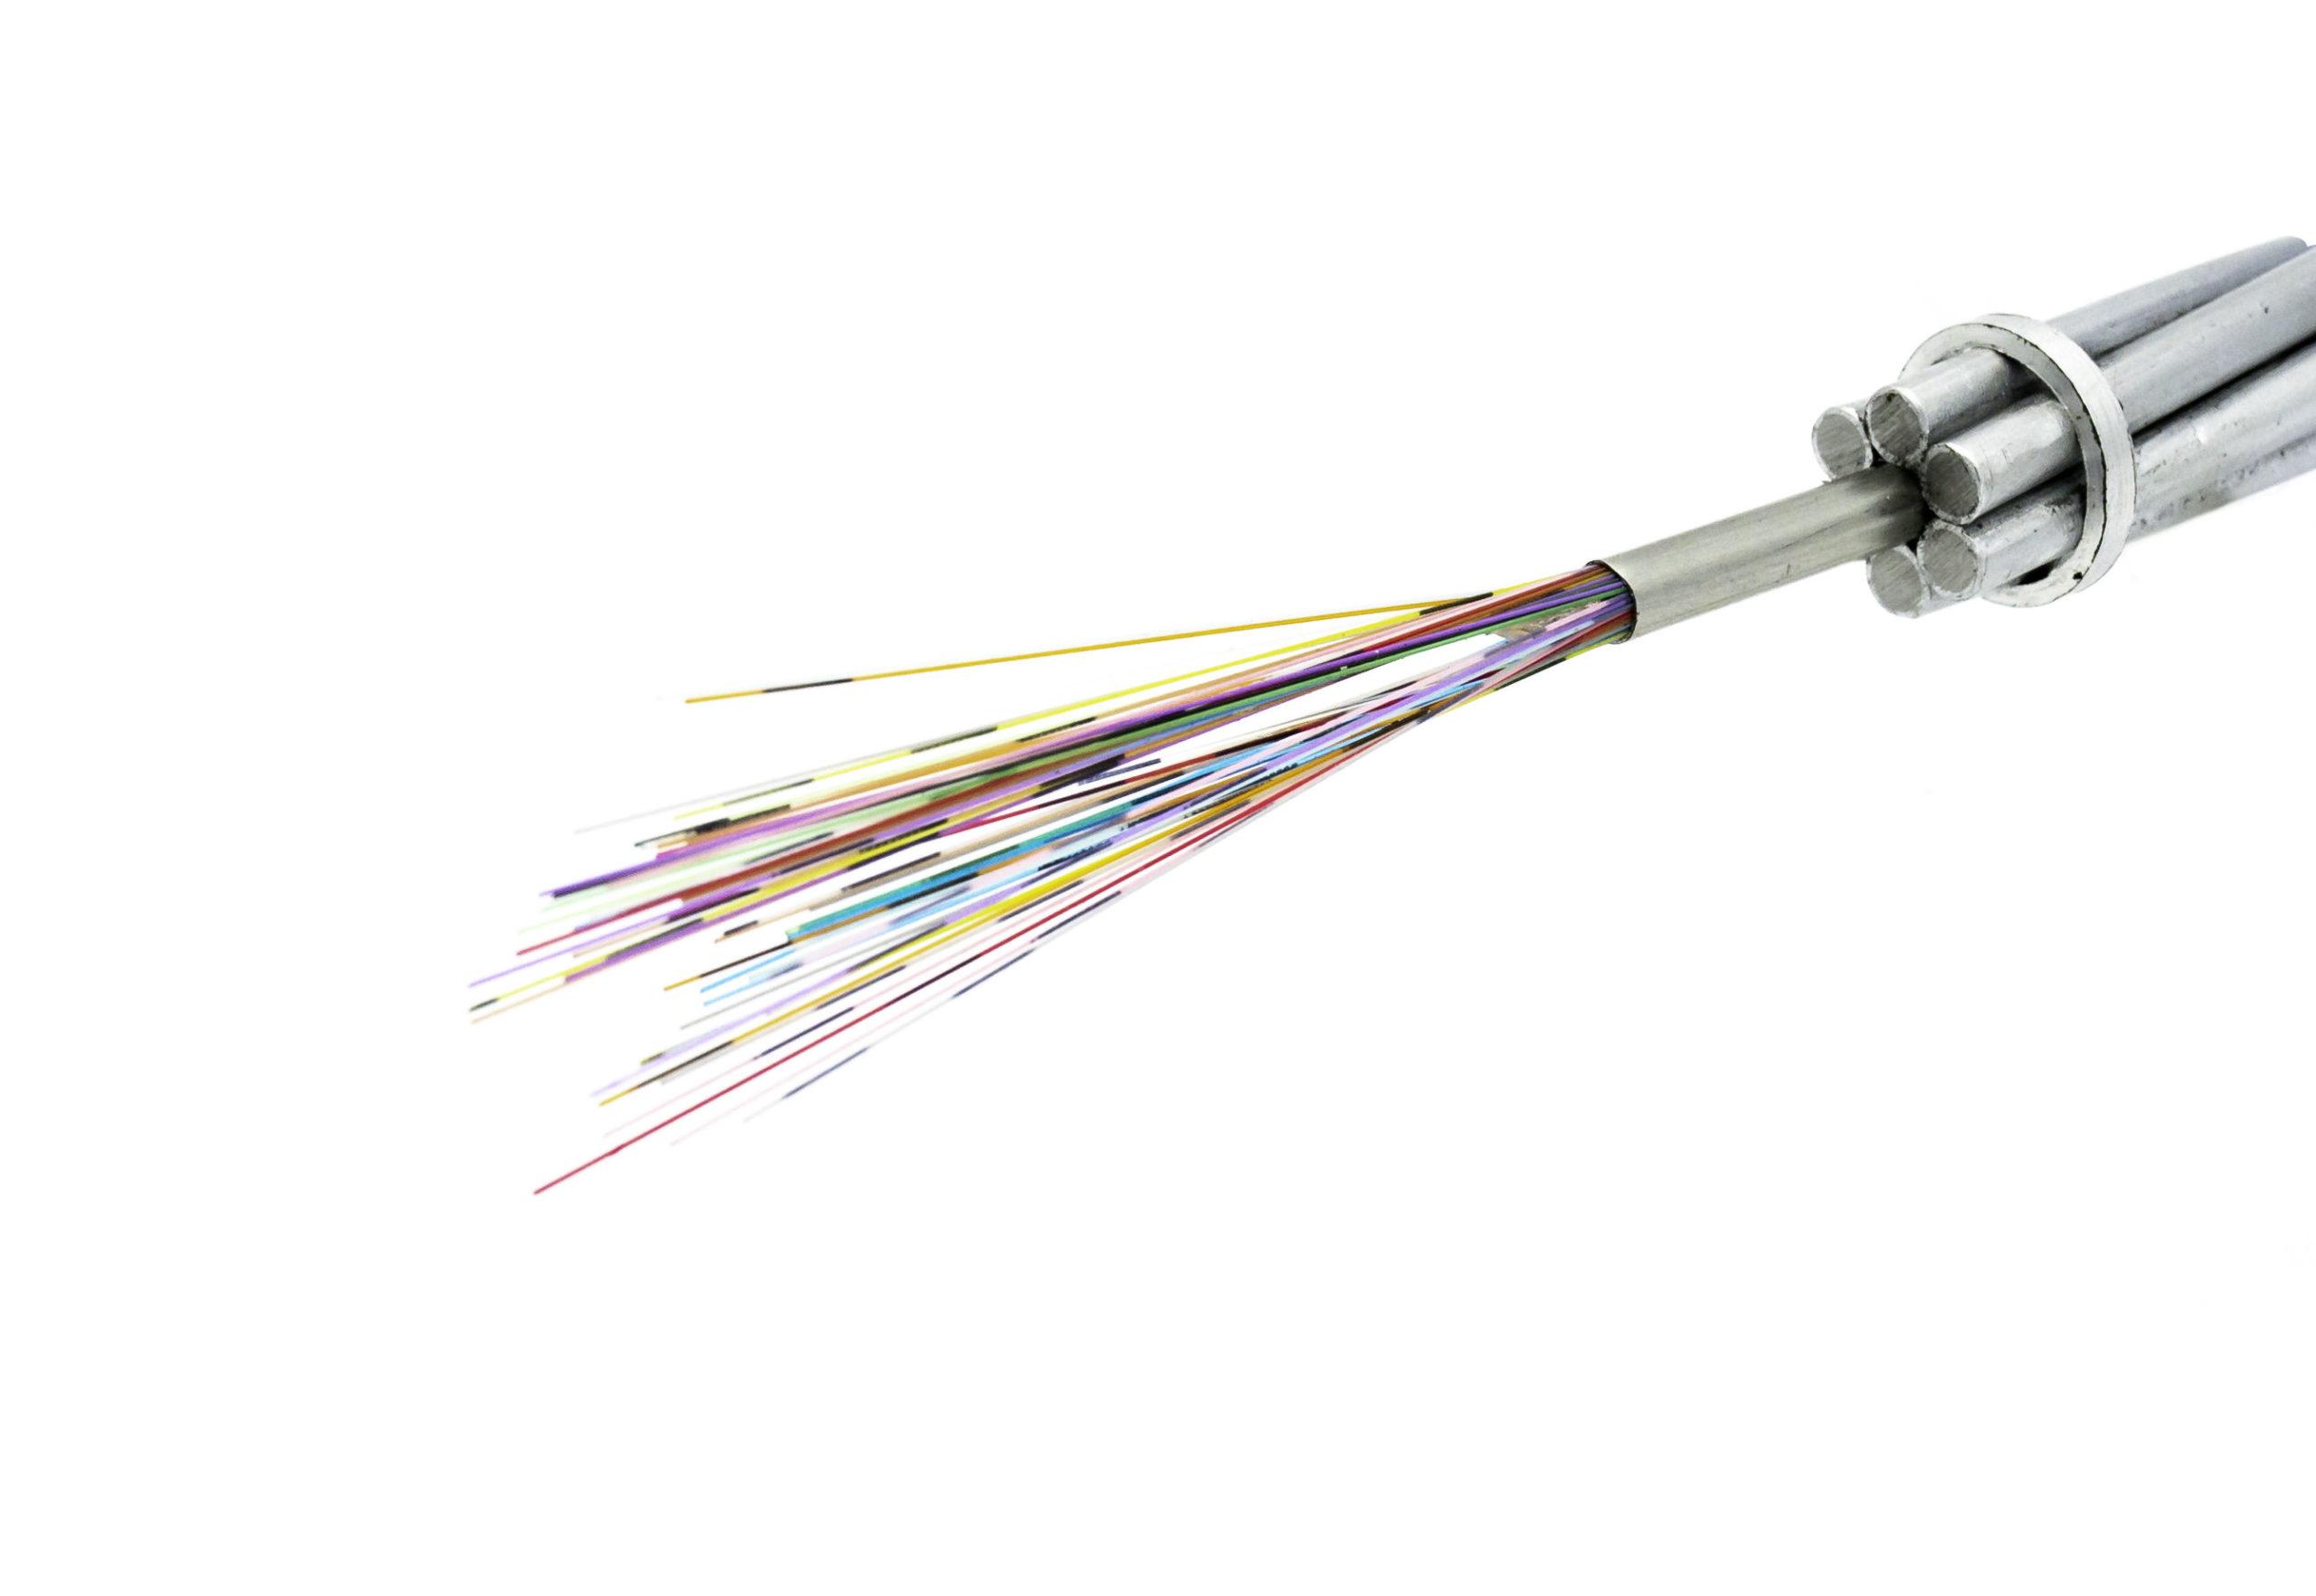 OPGW (Optical Ground Wire)